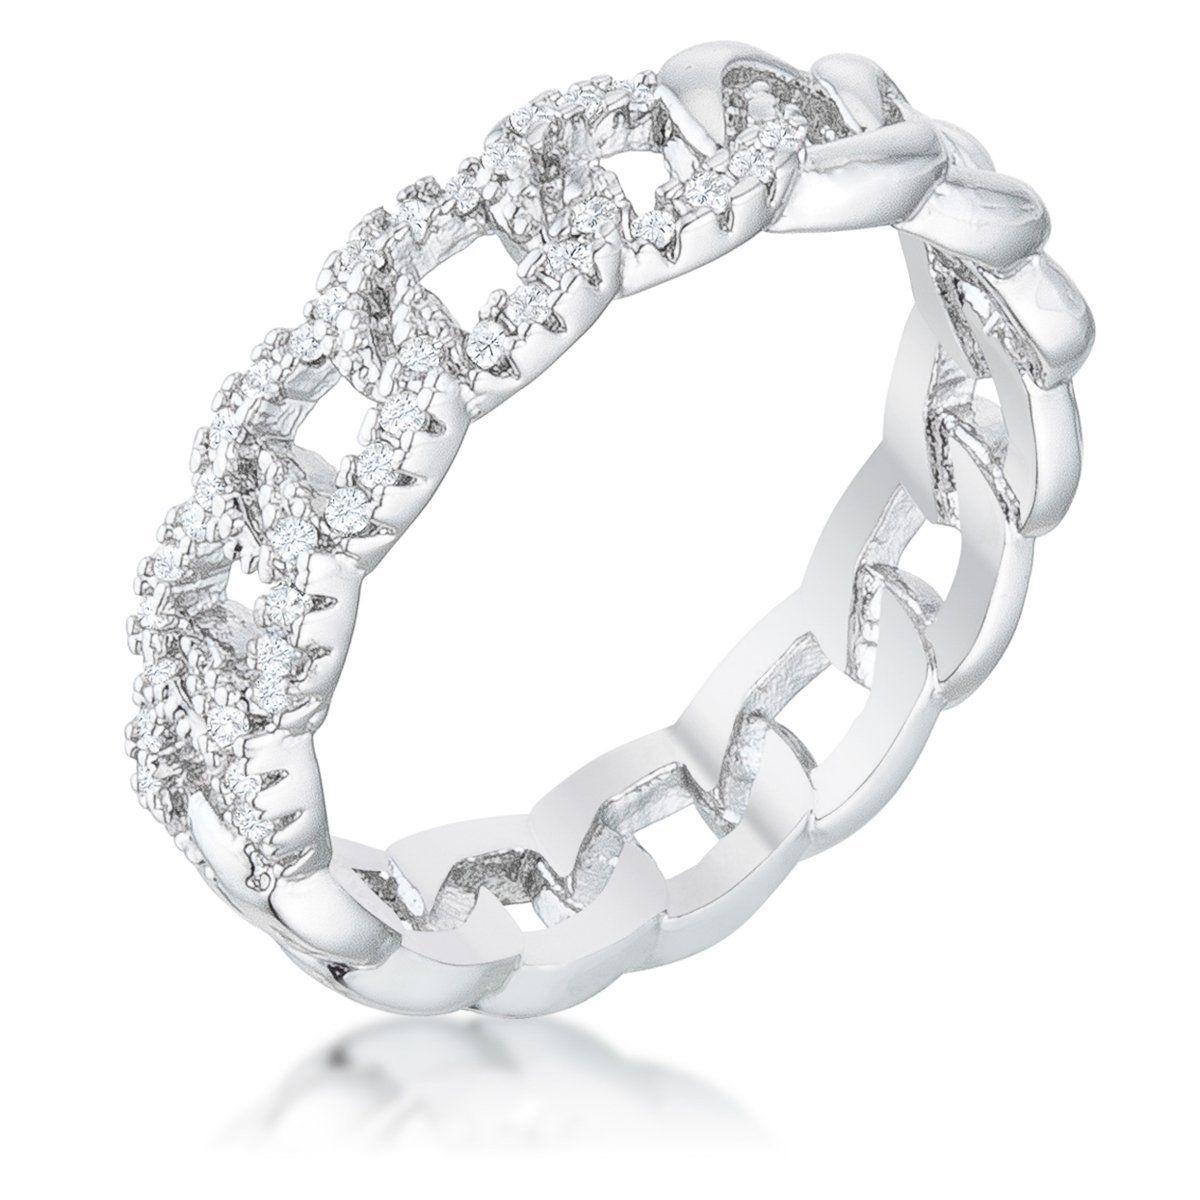 Interlocking Rhodium Chain Design Ring with CZ Designer Jewelry